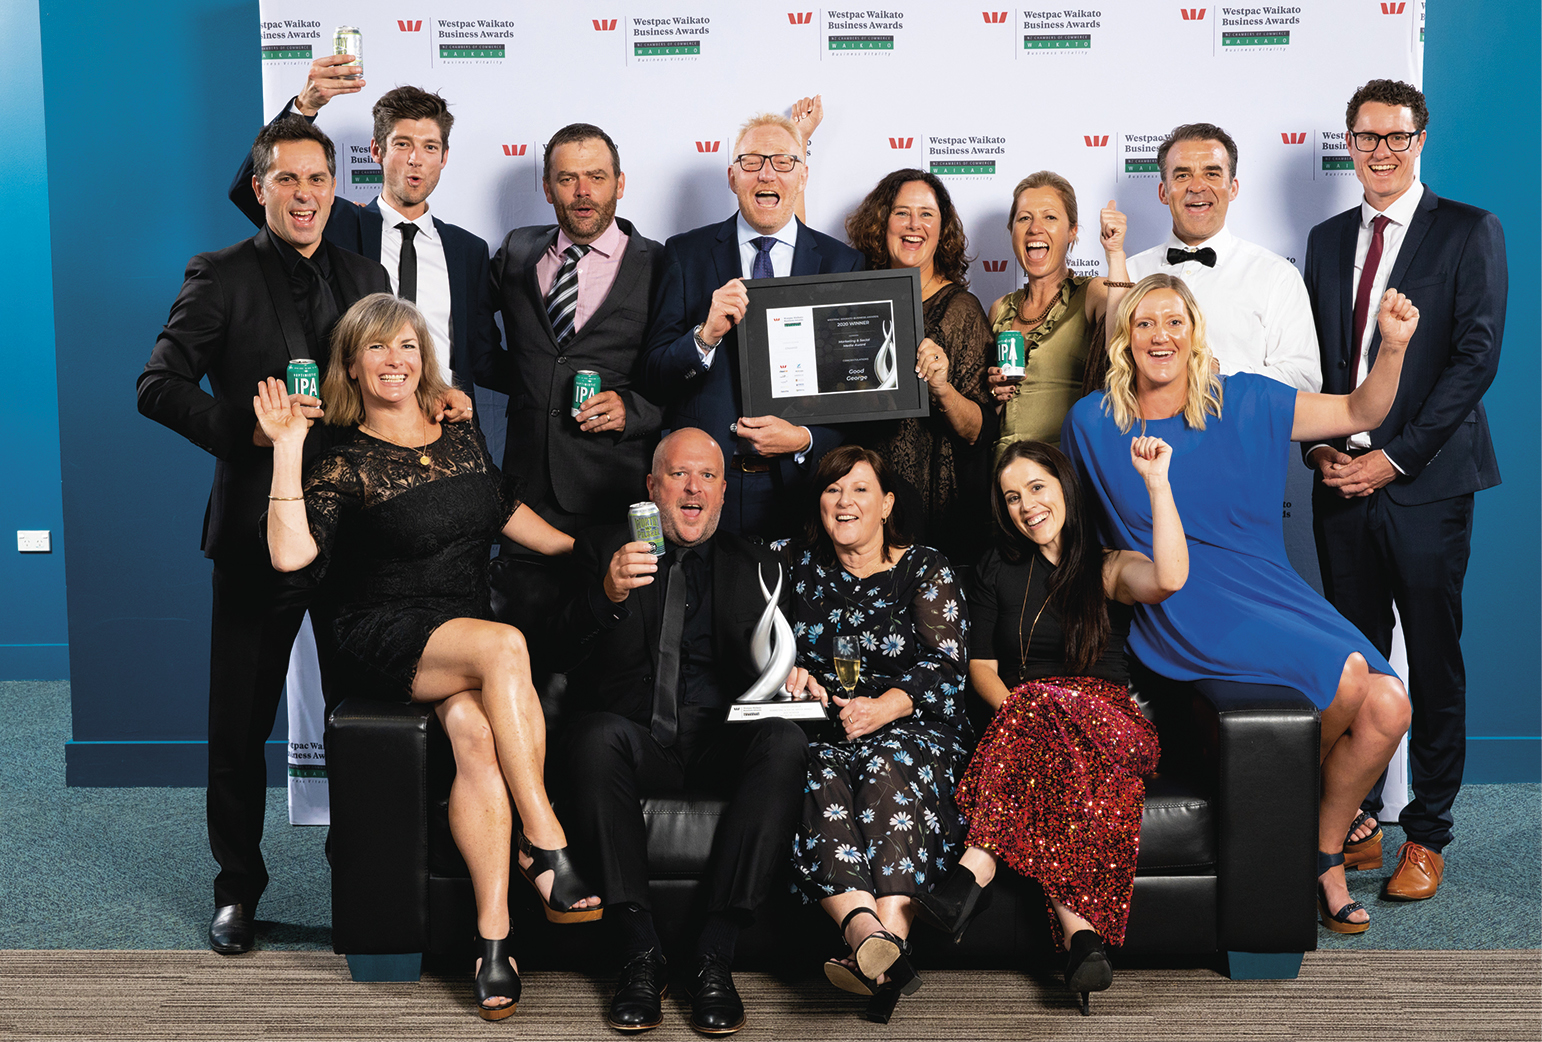 Marketing and Social Media award winners Good George